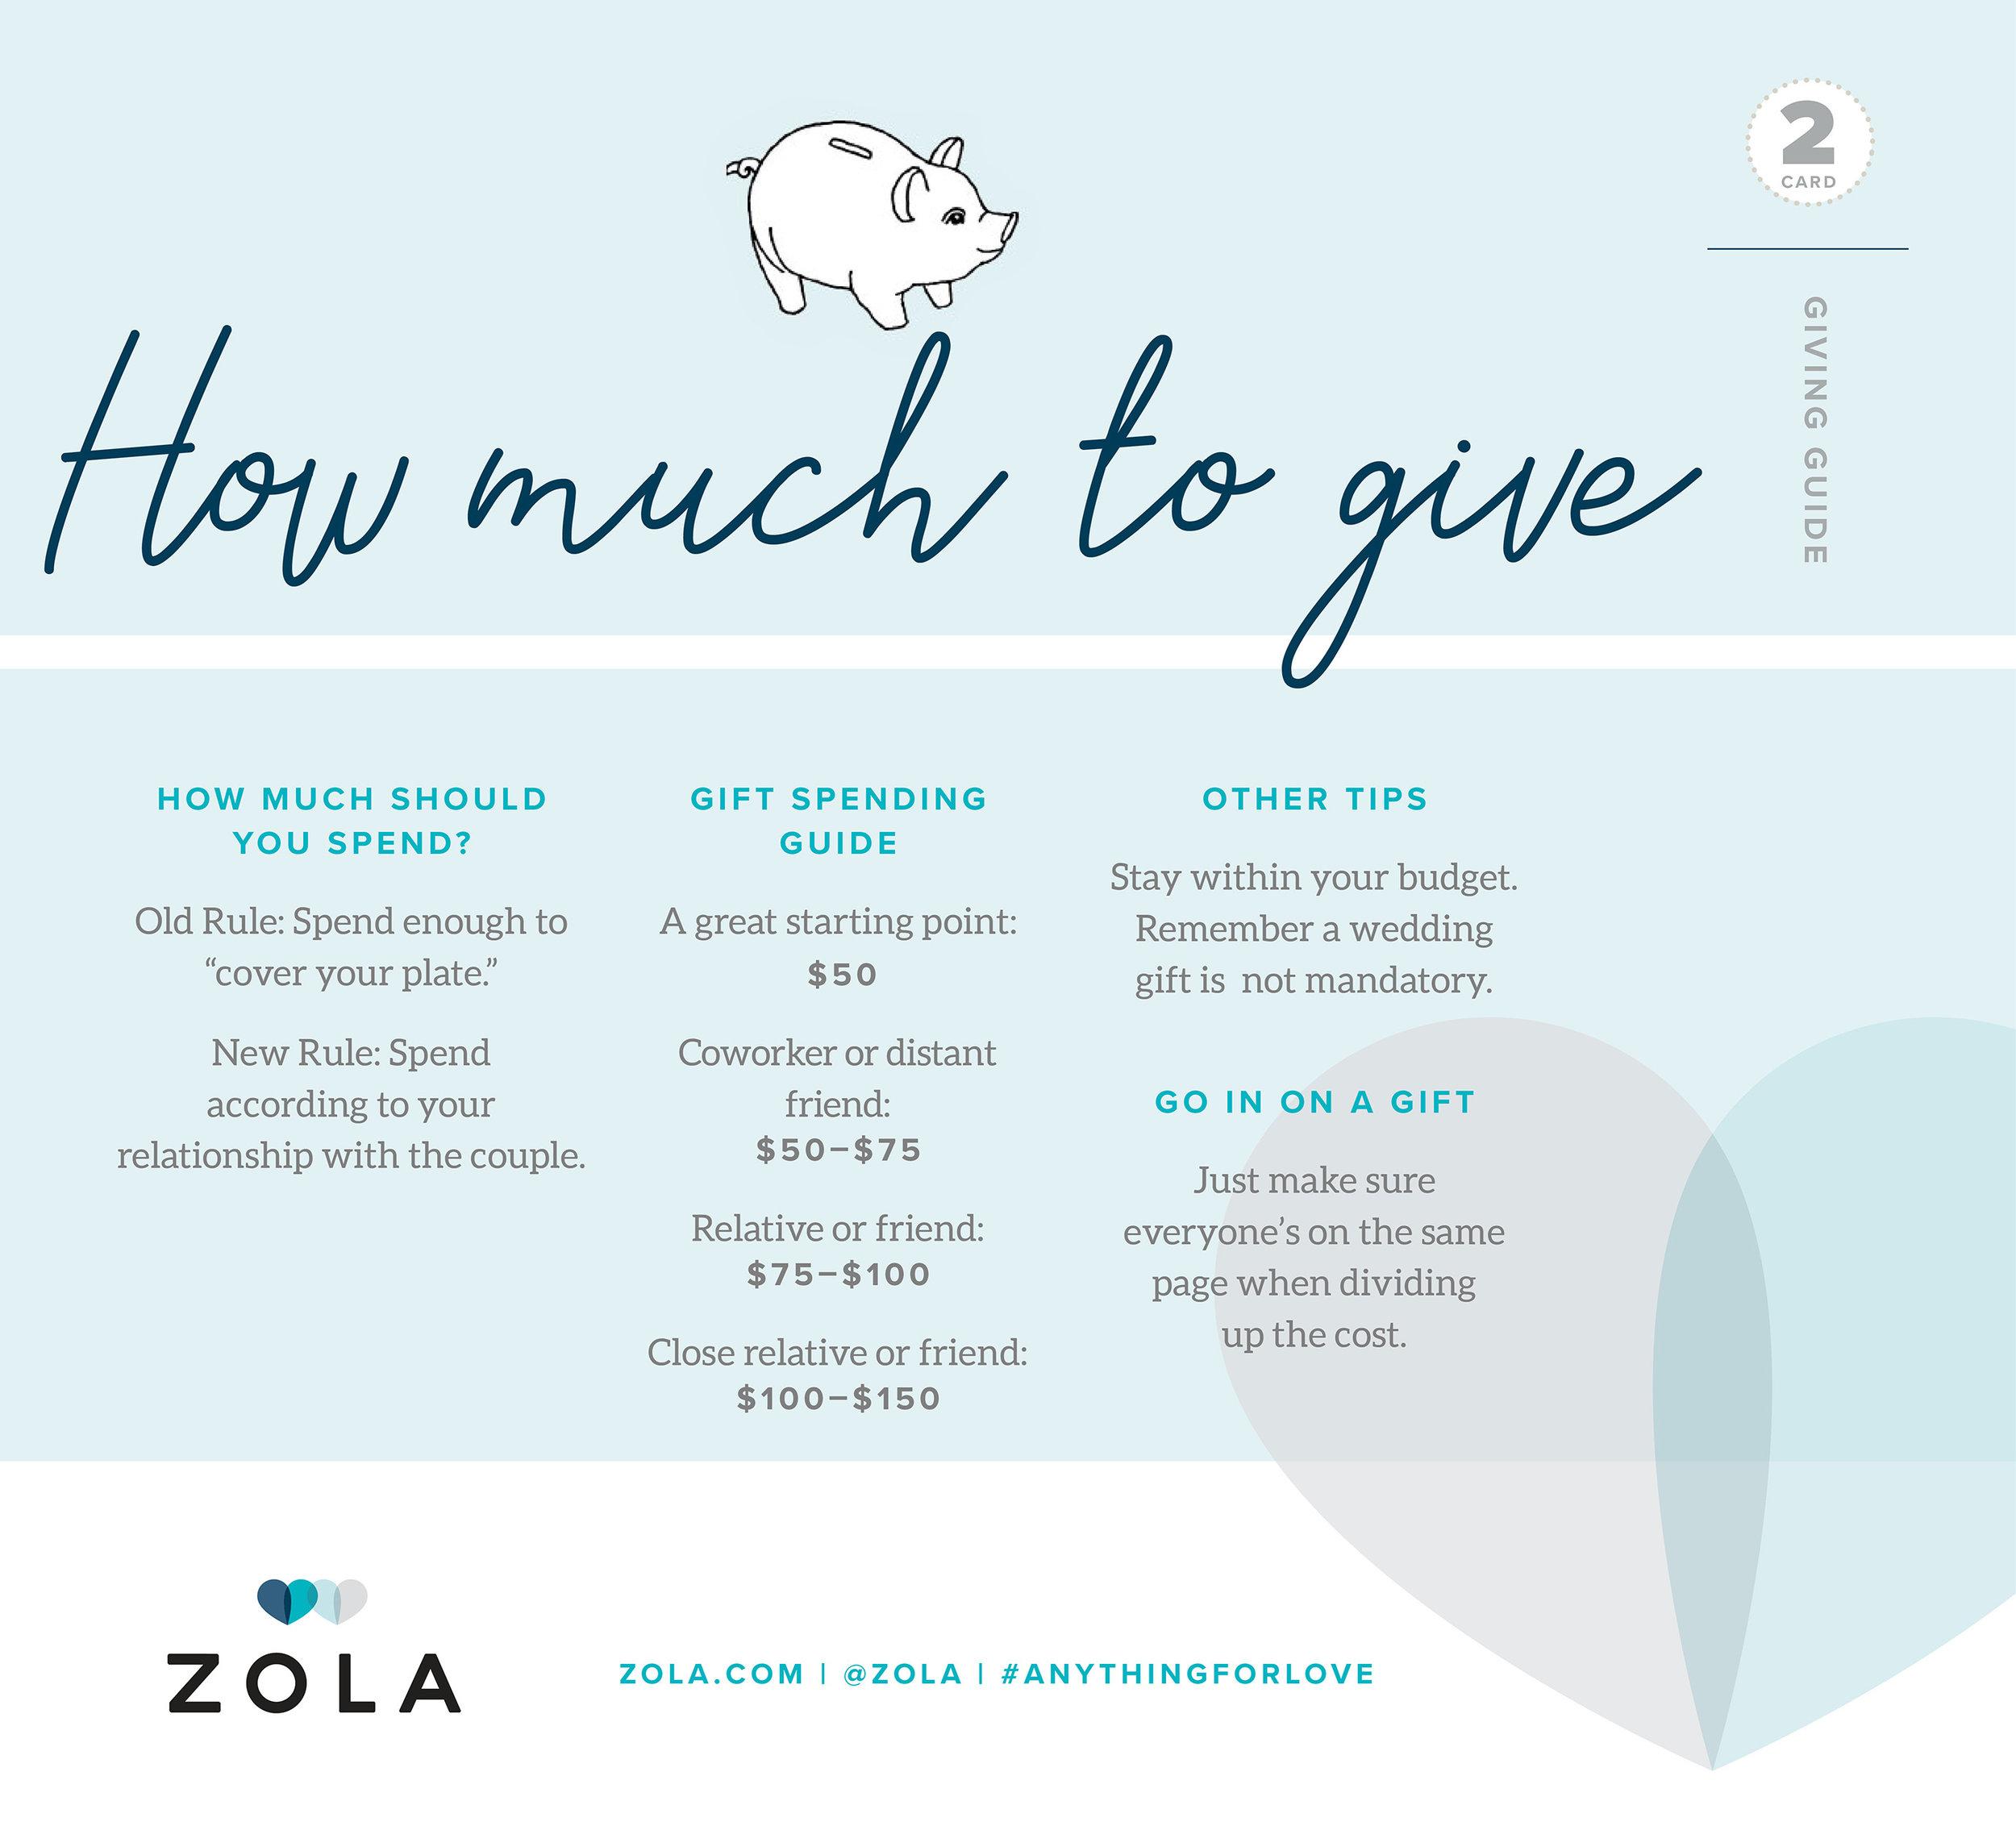 Zola_card2-01.jpg